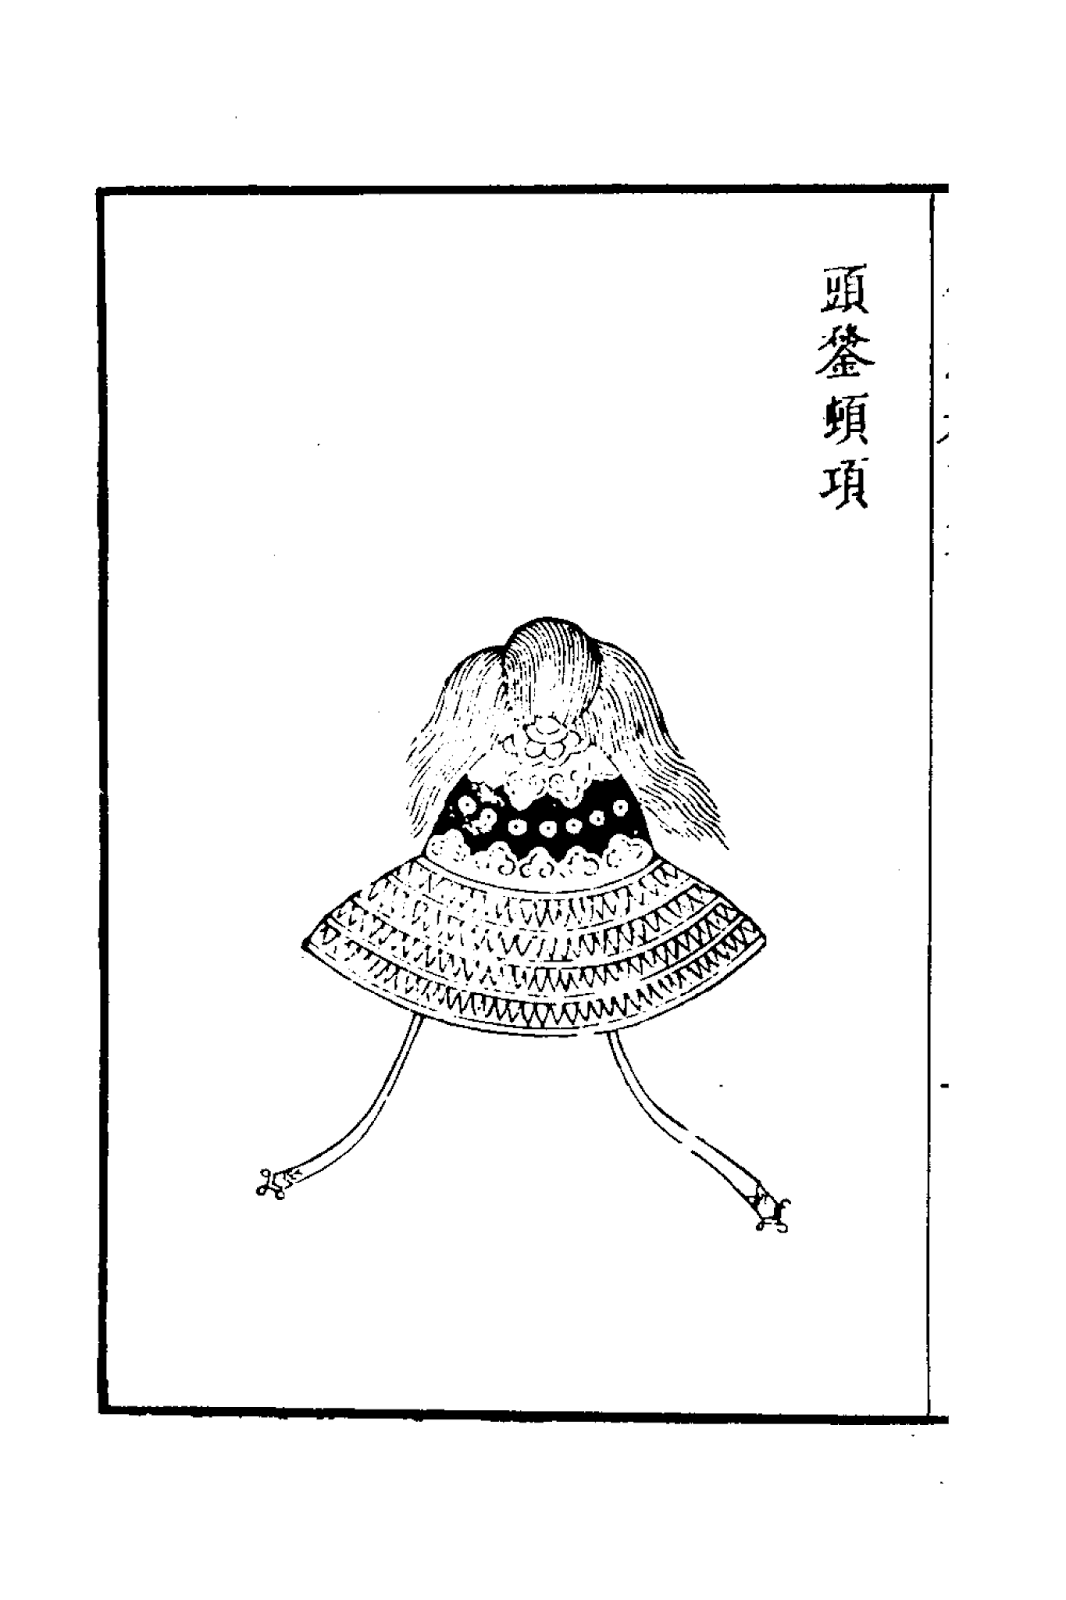 Ming Helmet